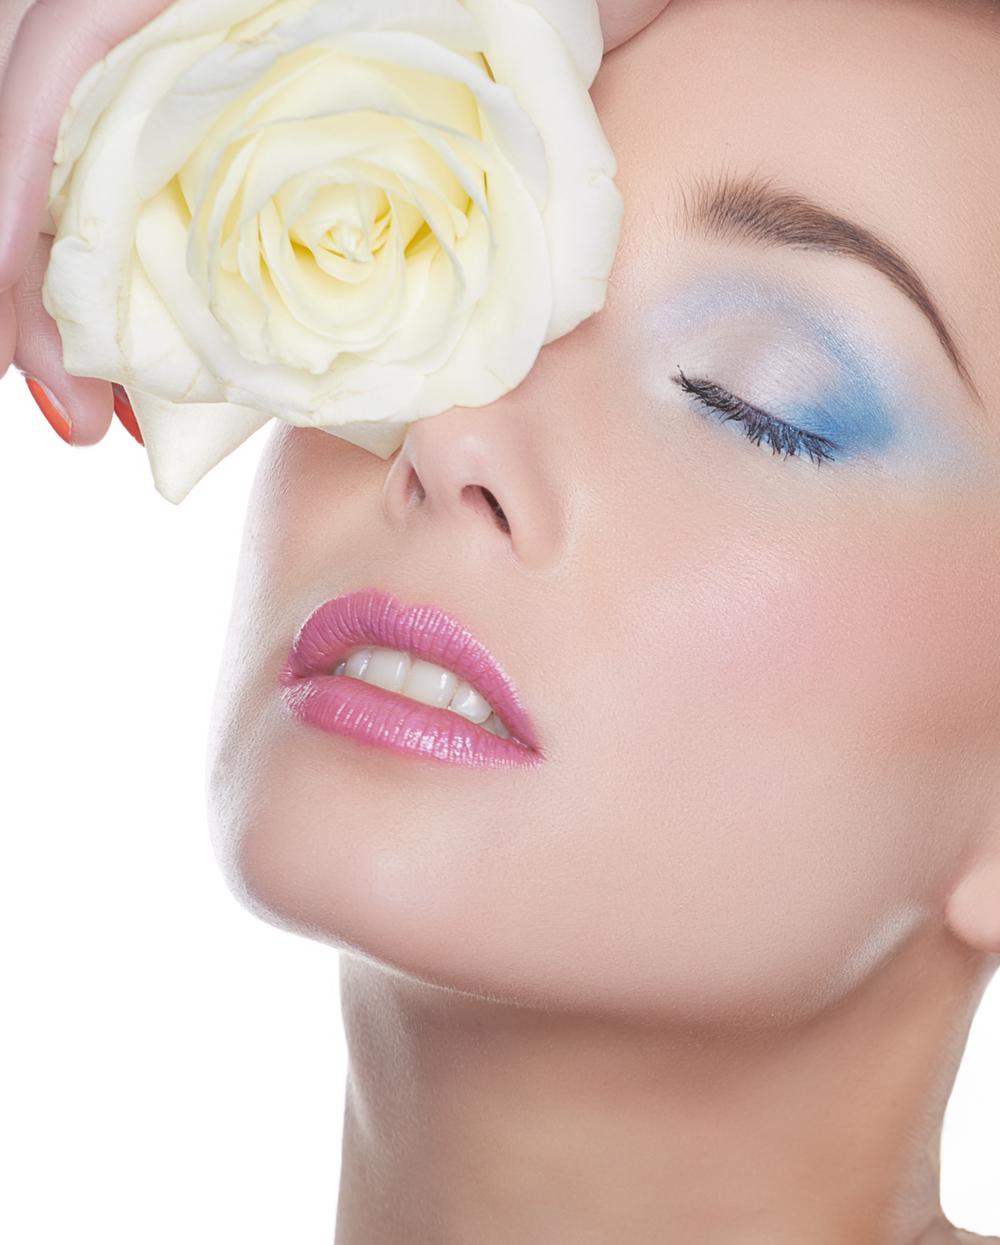 K14_9892-264-Kamal Mostofi-ZyZi Makeup-FlowerBeauty.jpg